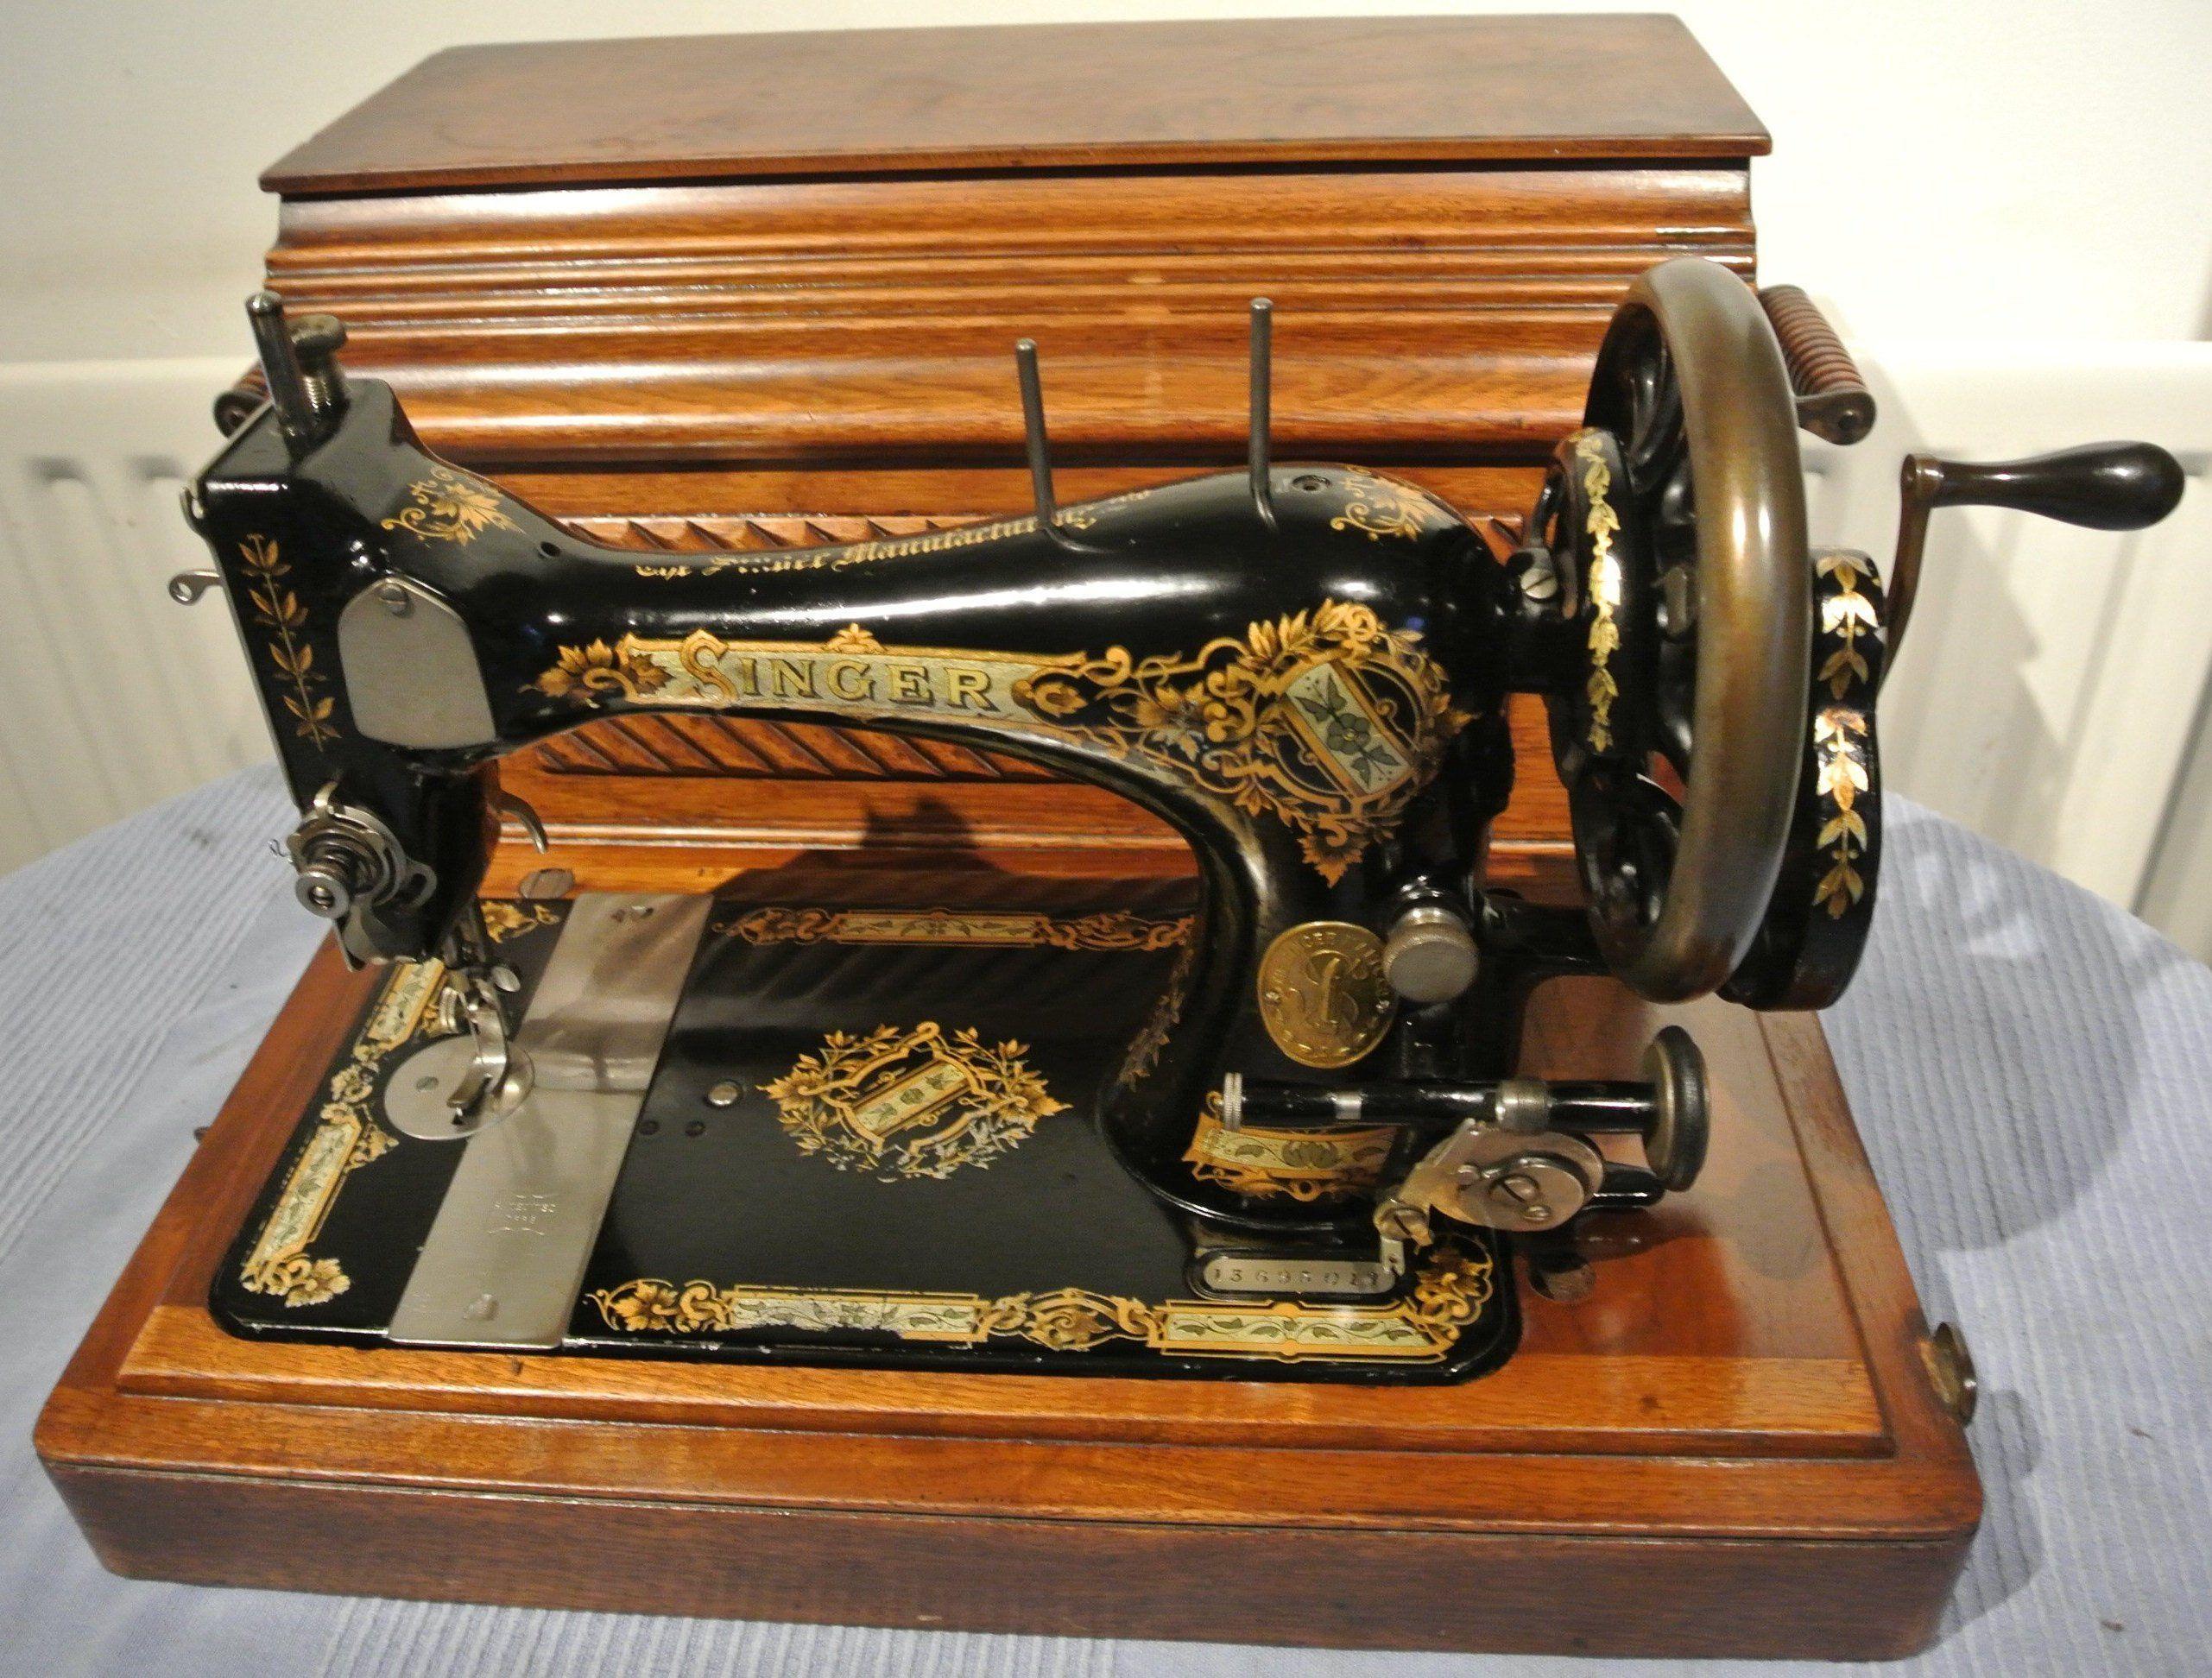 1896 Singer 28k Handcrank Antique Sewing Machine With Victorian Decals Vintage Home Decor Vintage Dresses Cushion Dollsewing Singer Sewing Machine Vintage Antique Sewing Machines Sewing Machine